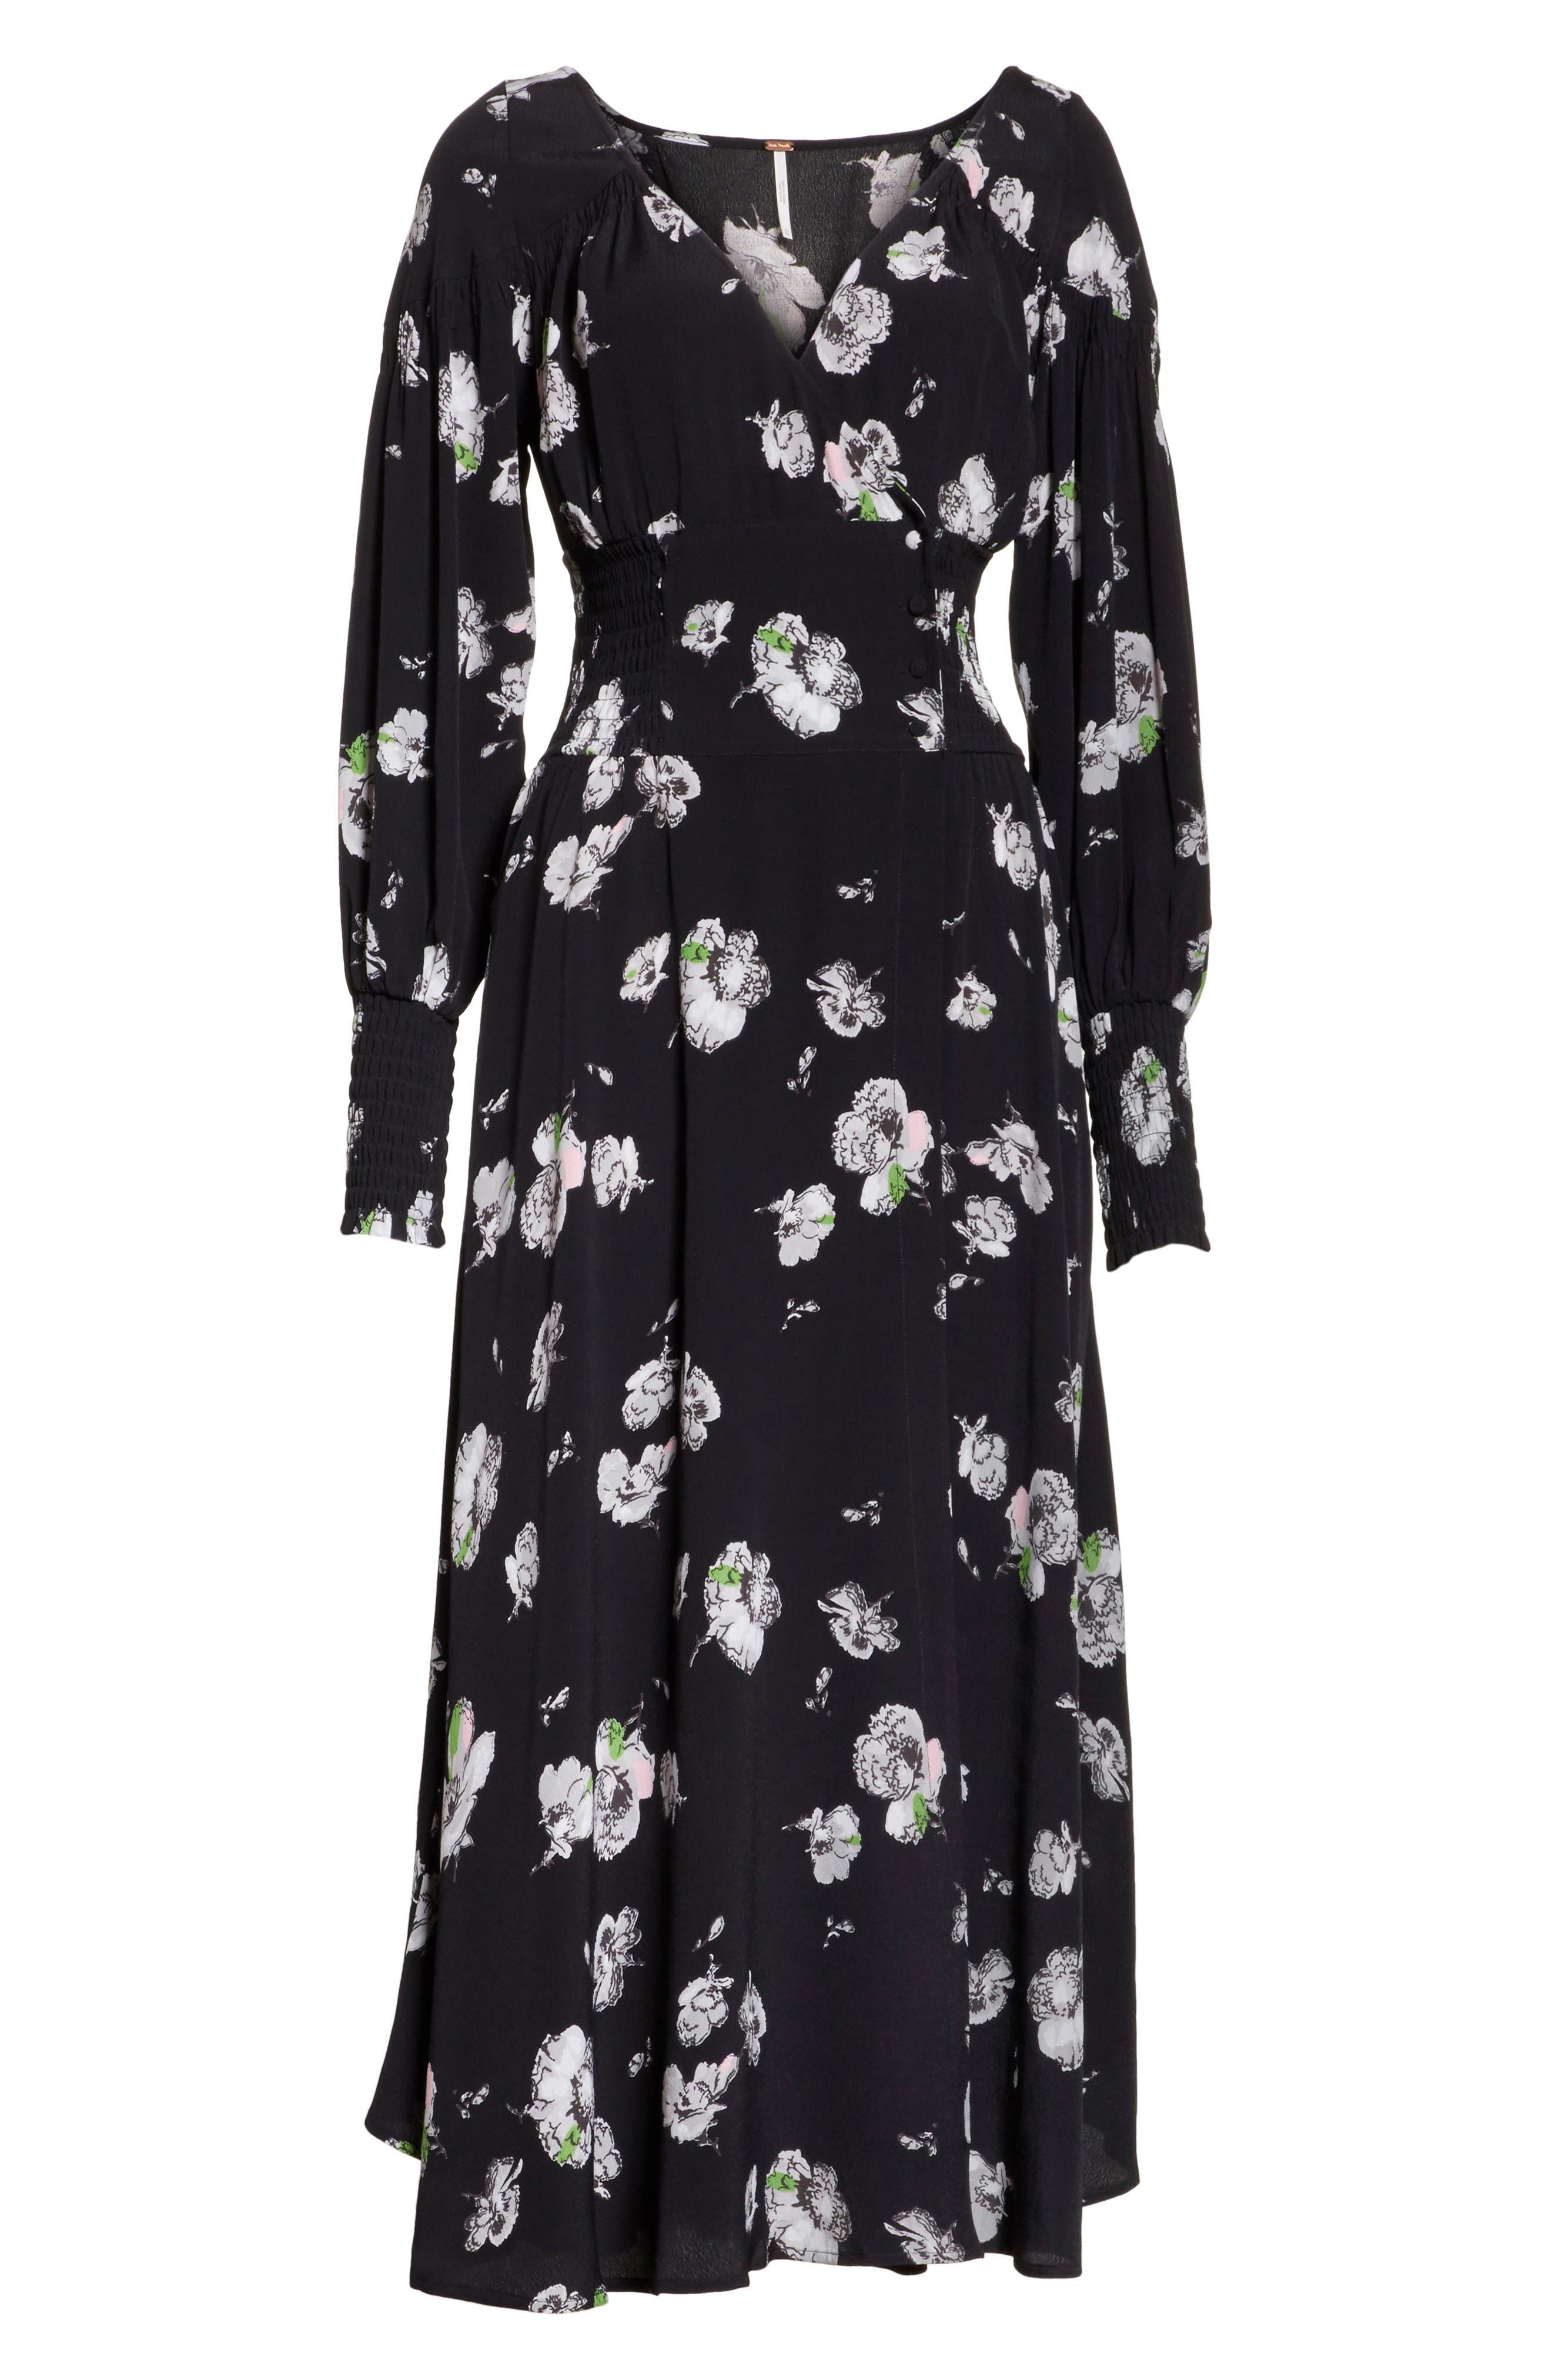 So Sweetly Midi Dress,                             Alternate thumbnail 6, color,                             001